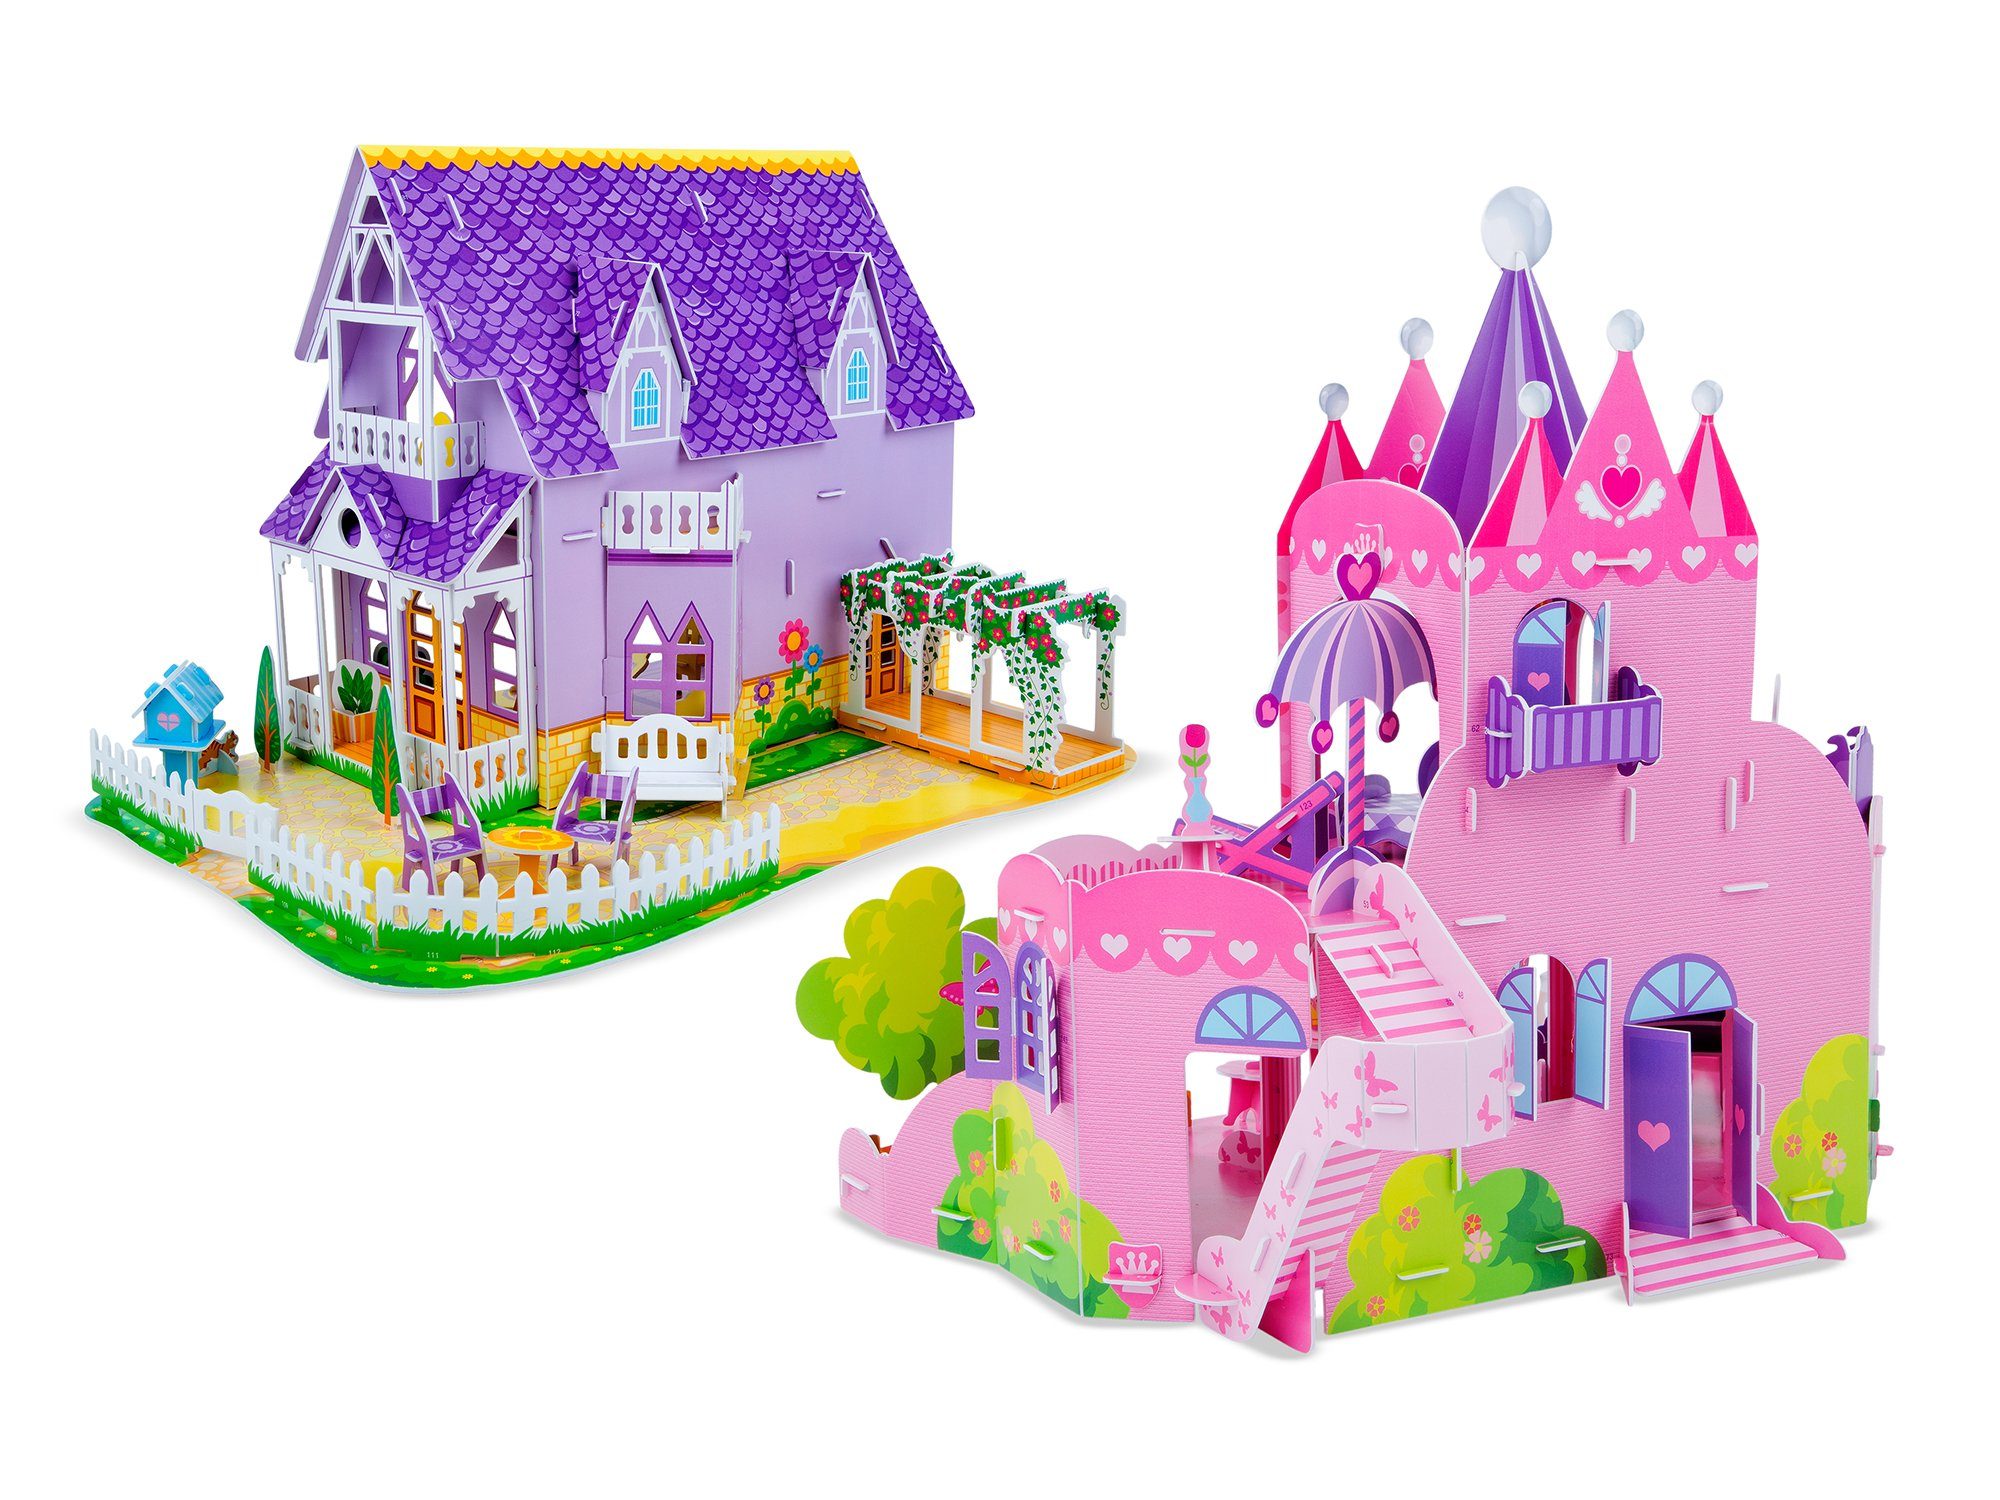 Melissa & Doug 3-D Puzzle Kits Set: Pretty Purple Dollhouse and Pink Palace